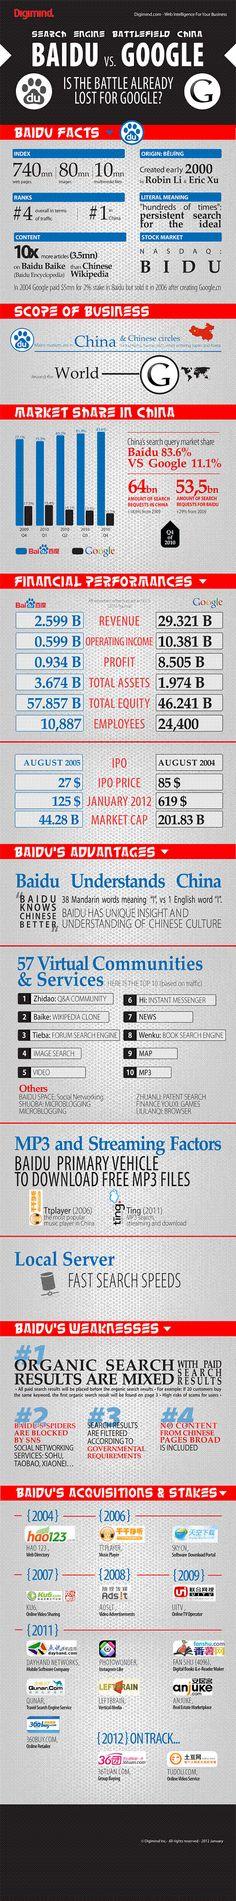 The battle between Baidu and Google. #China Webmarketing